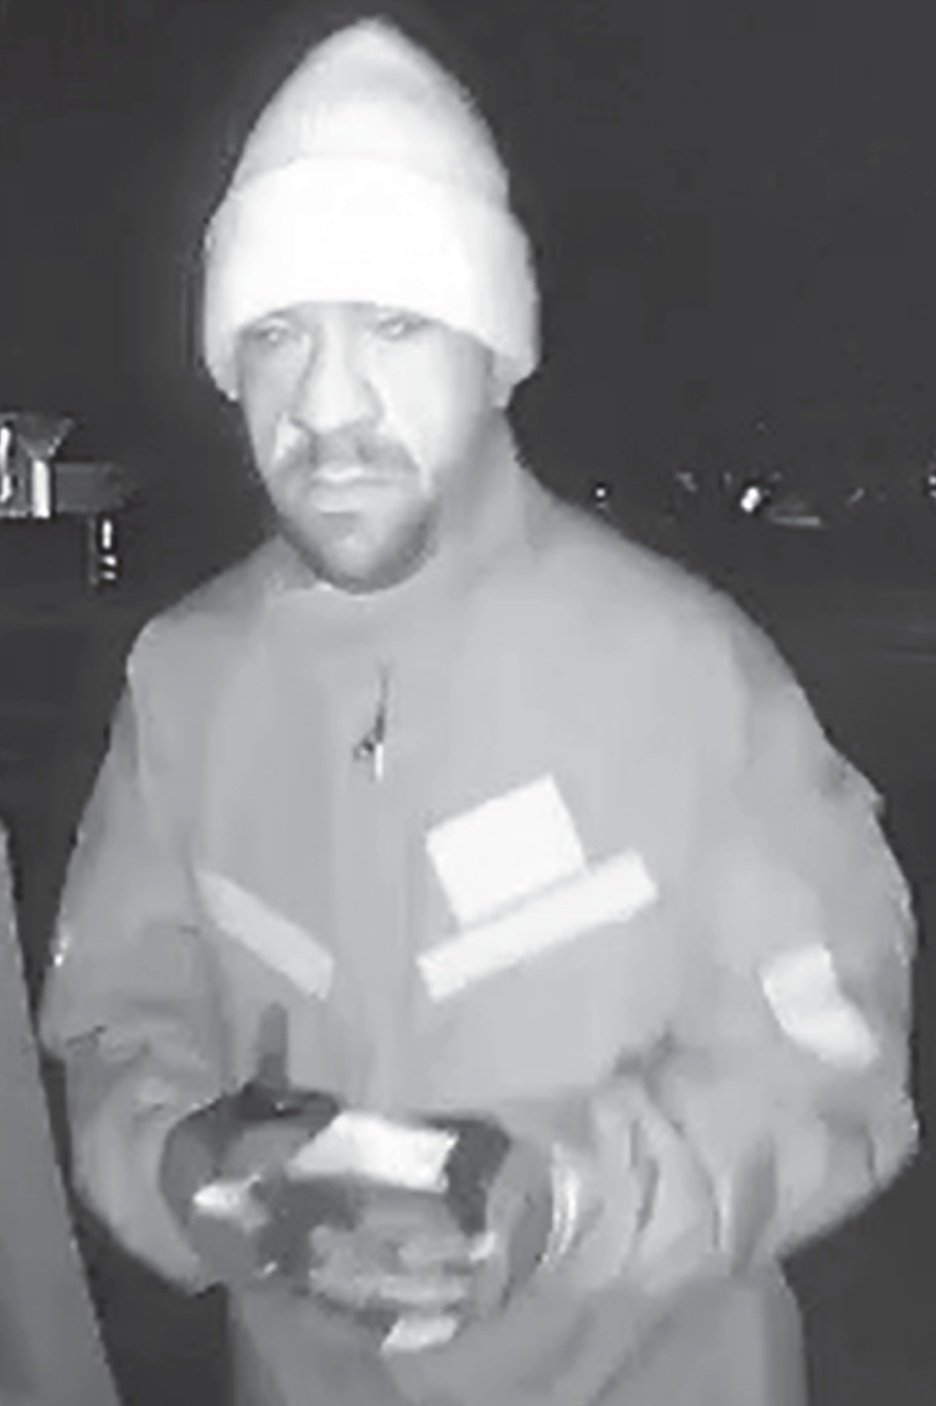 Maryland man admits to leaving threatening letter on Biden-Harris supporter's doorstep